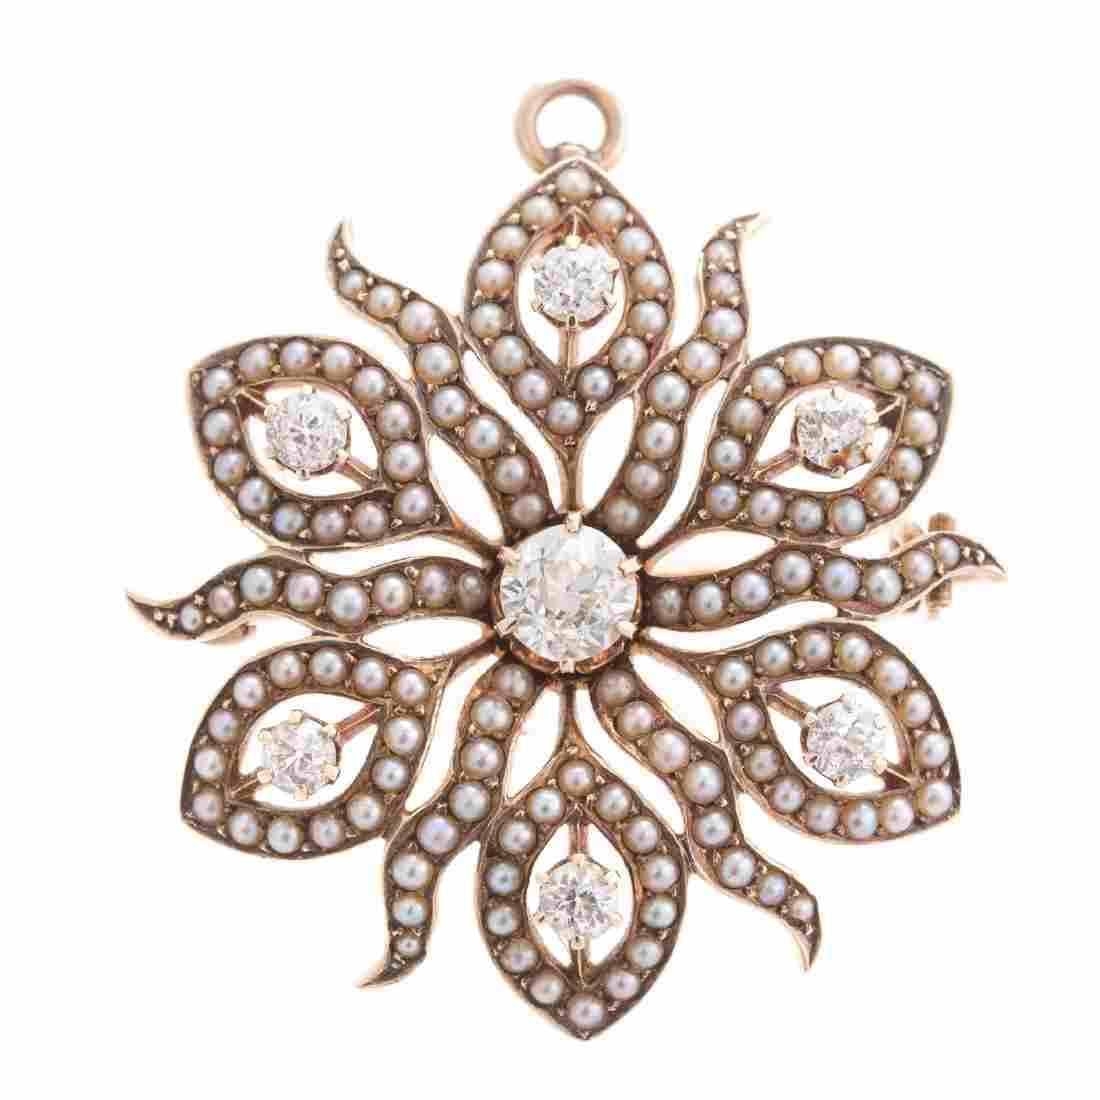 A Lady's Victorian Diamond Pendant/Brooch in 14K